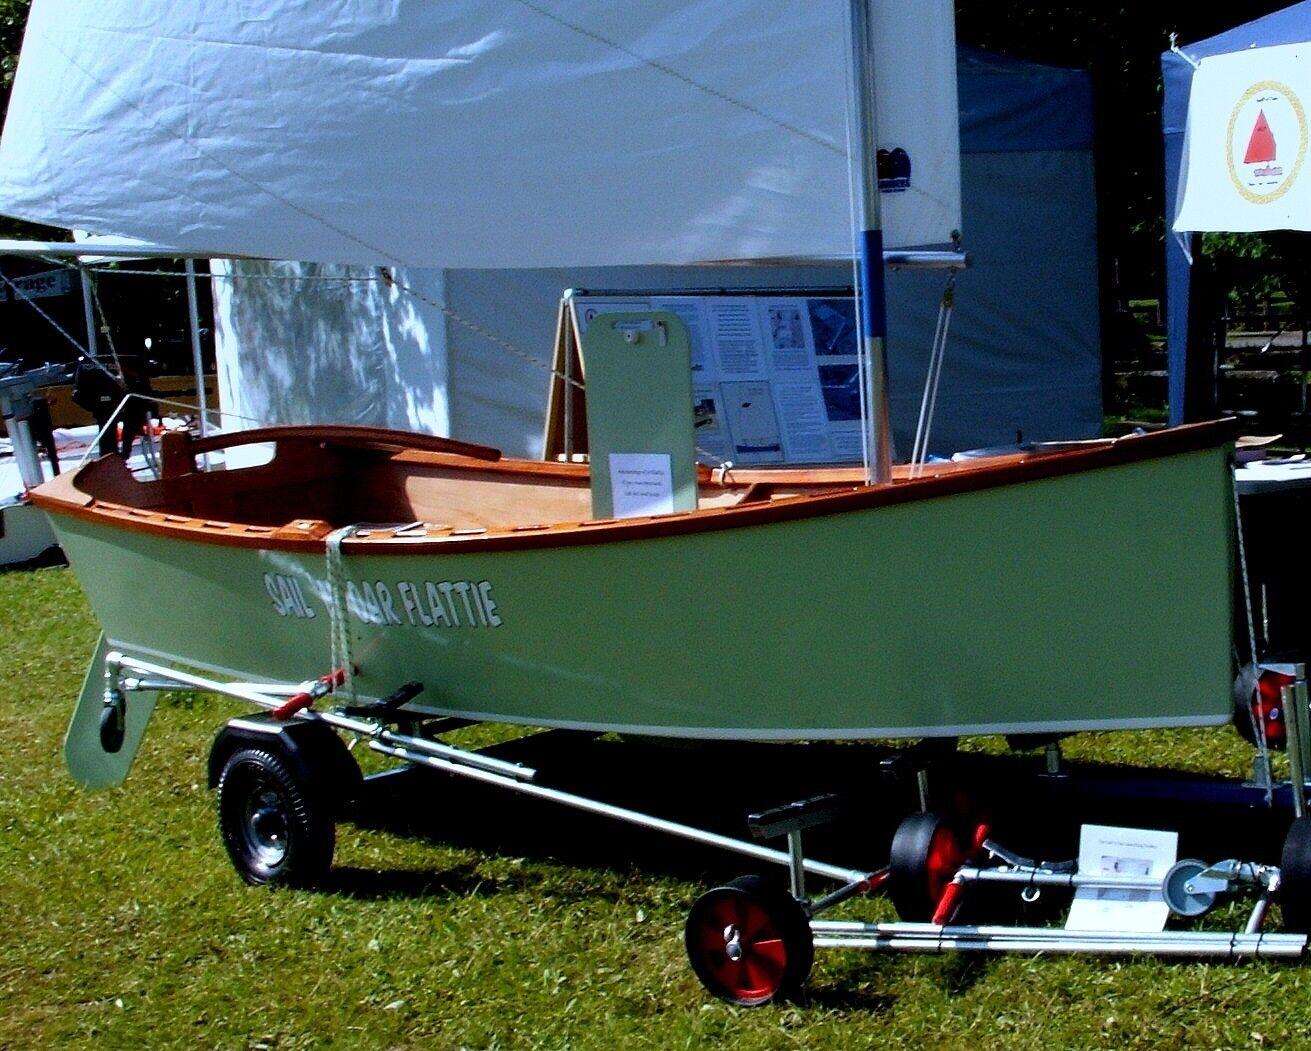 DIY Sailing Dinghy Skiff Plans and Builders Manual